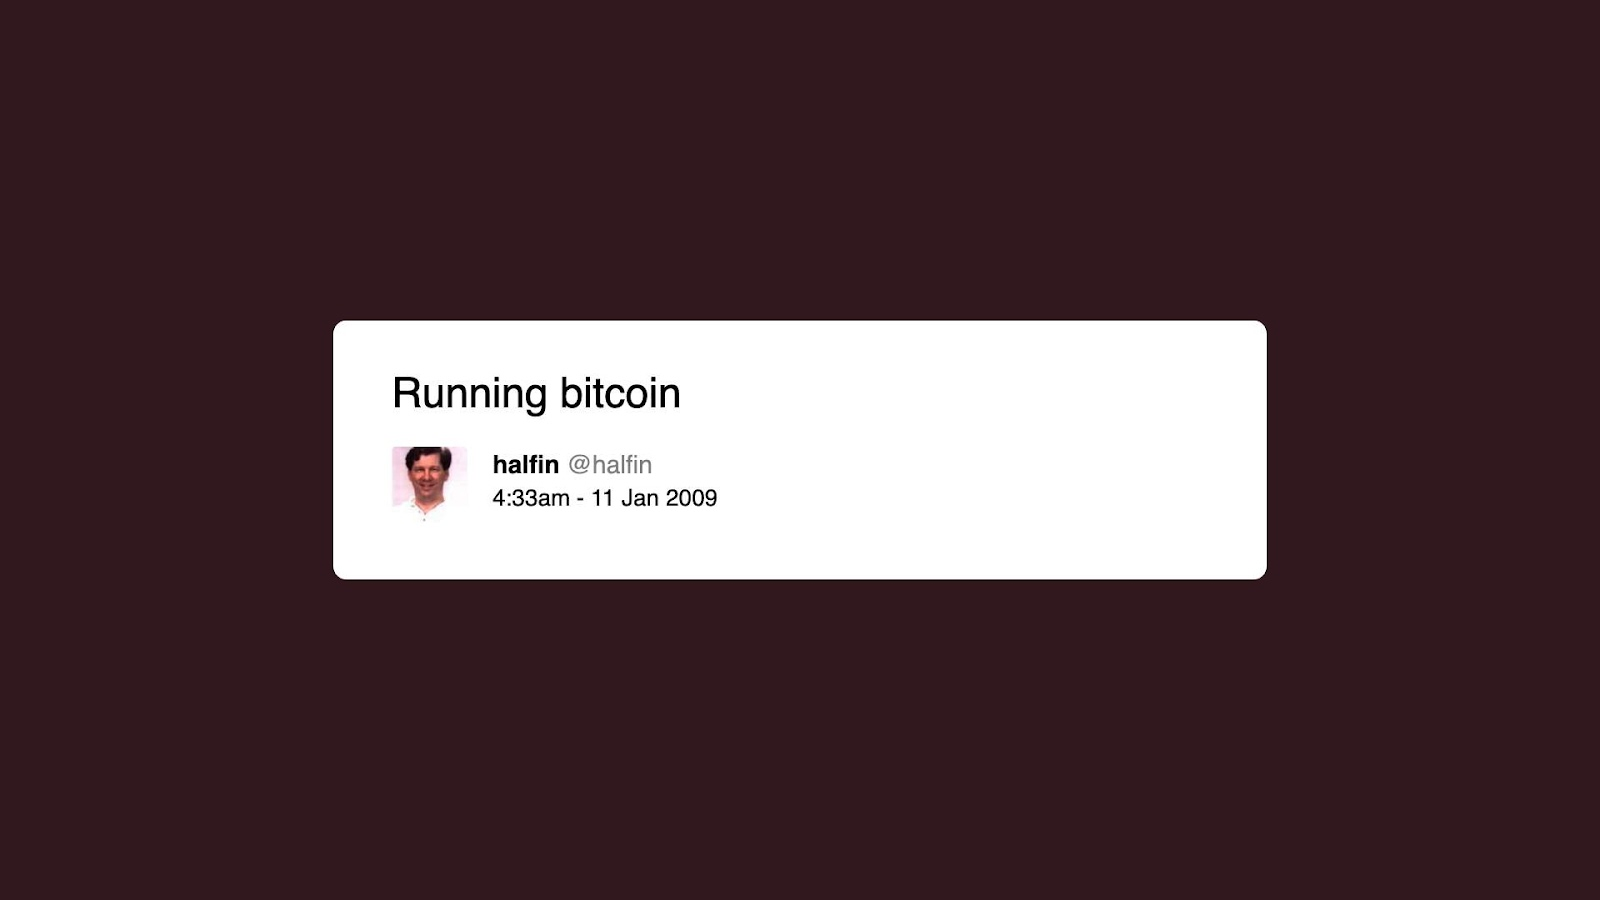 Hal Finney first bitcoin tweet